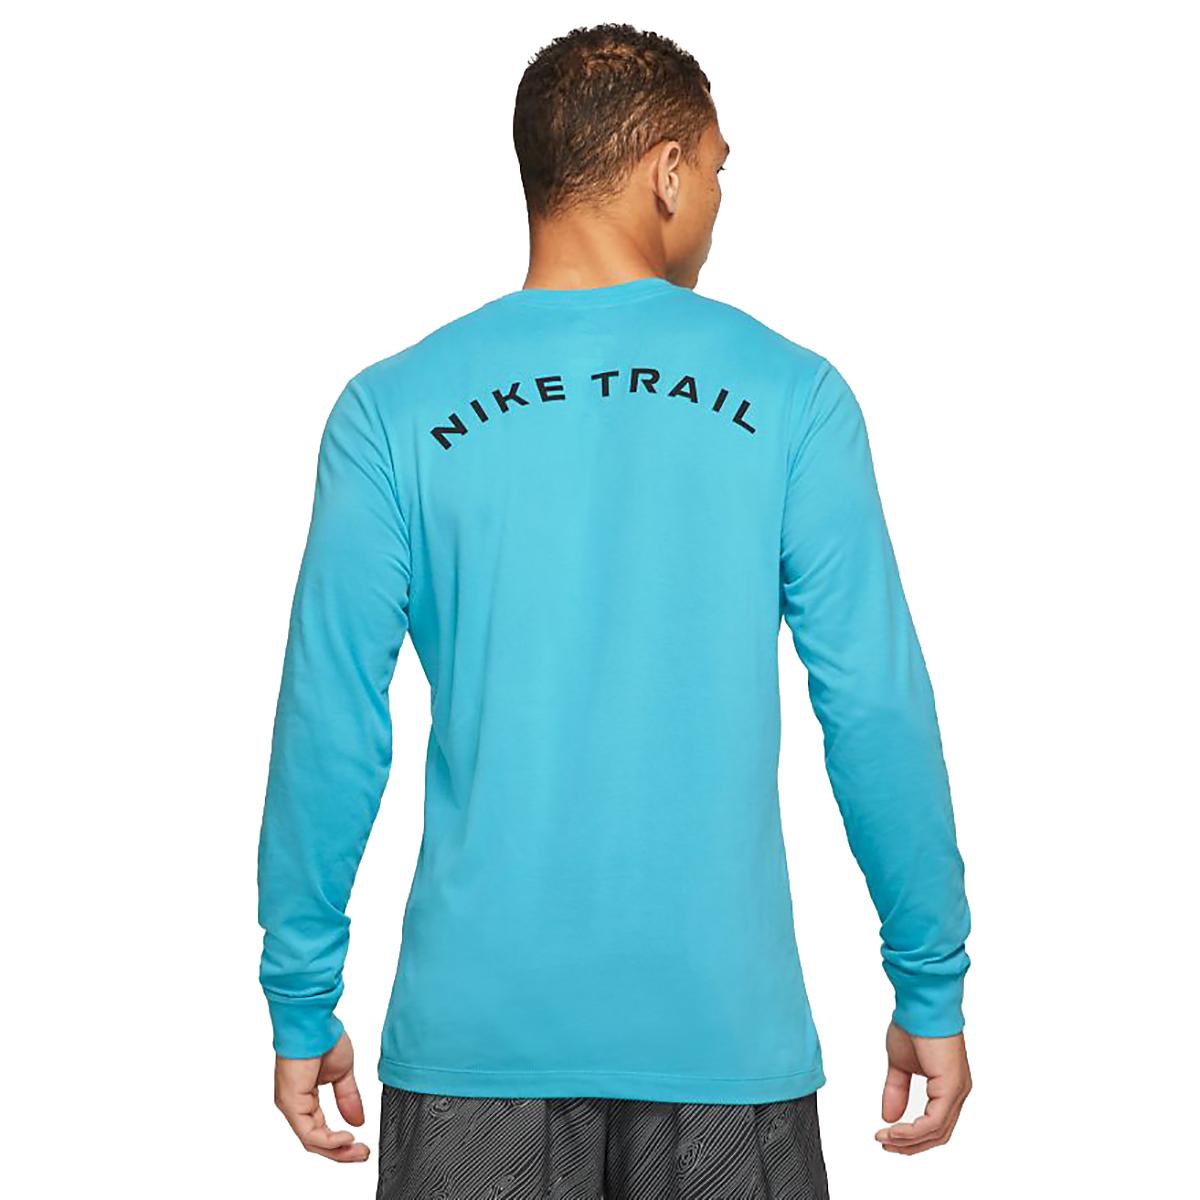 Men's Nike Dri-FIT Long-Sleeve Trail Running T-Shirt, , large, image 2